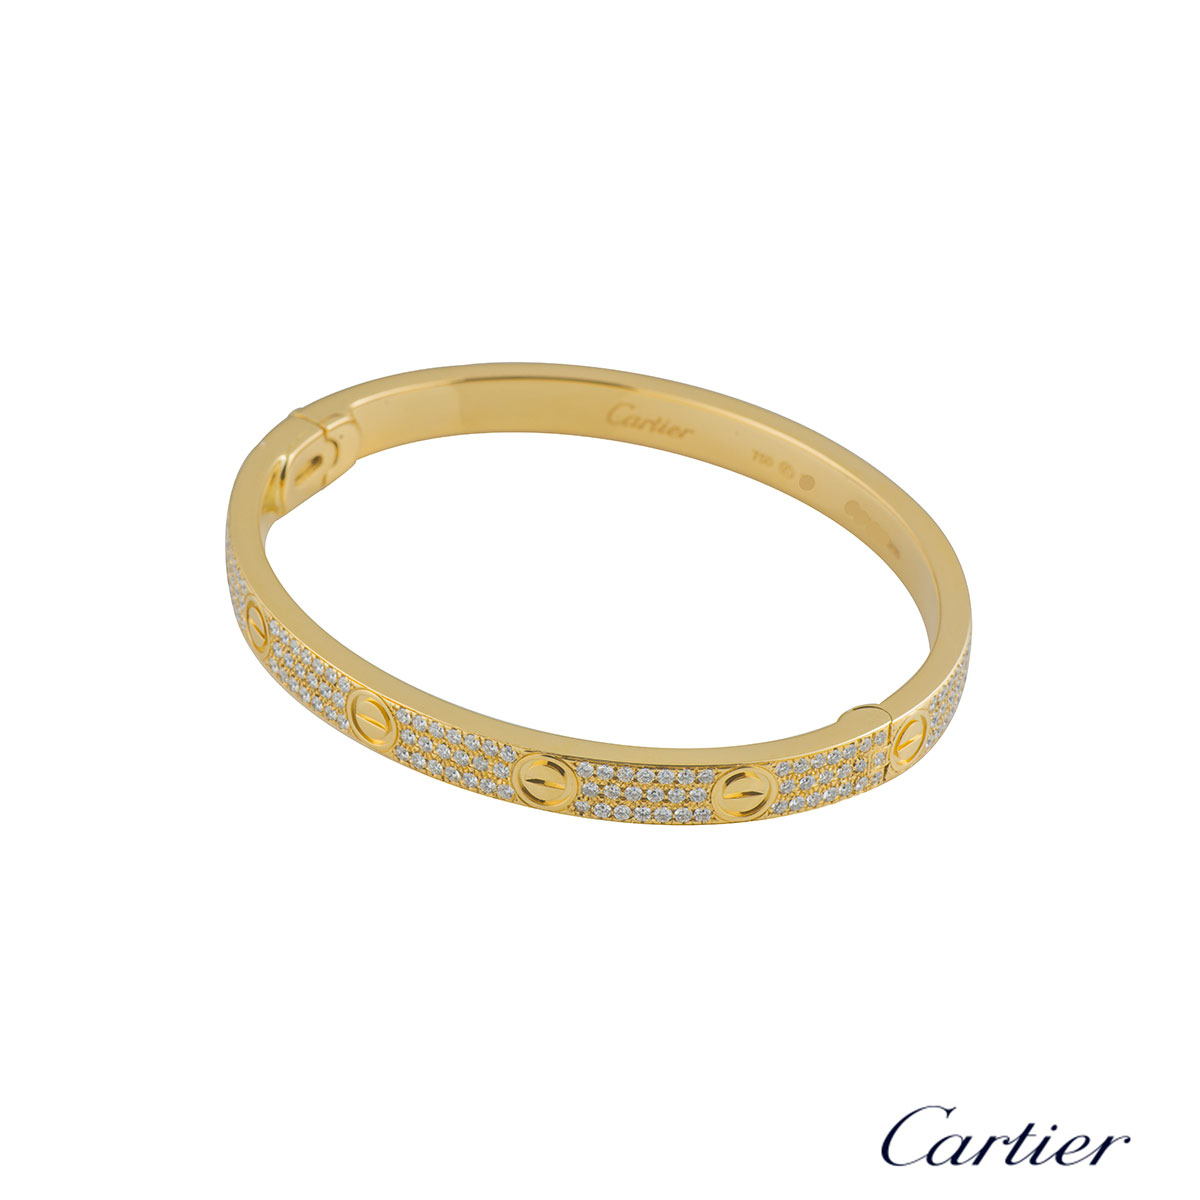 580502802431a6 ... Cartier Yellow Gold Pave Diamond Love Bracelet Size 18 N6035018 ...